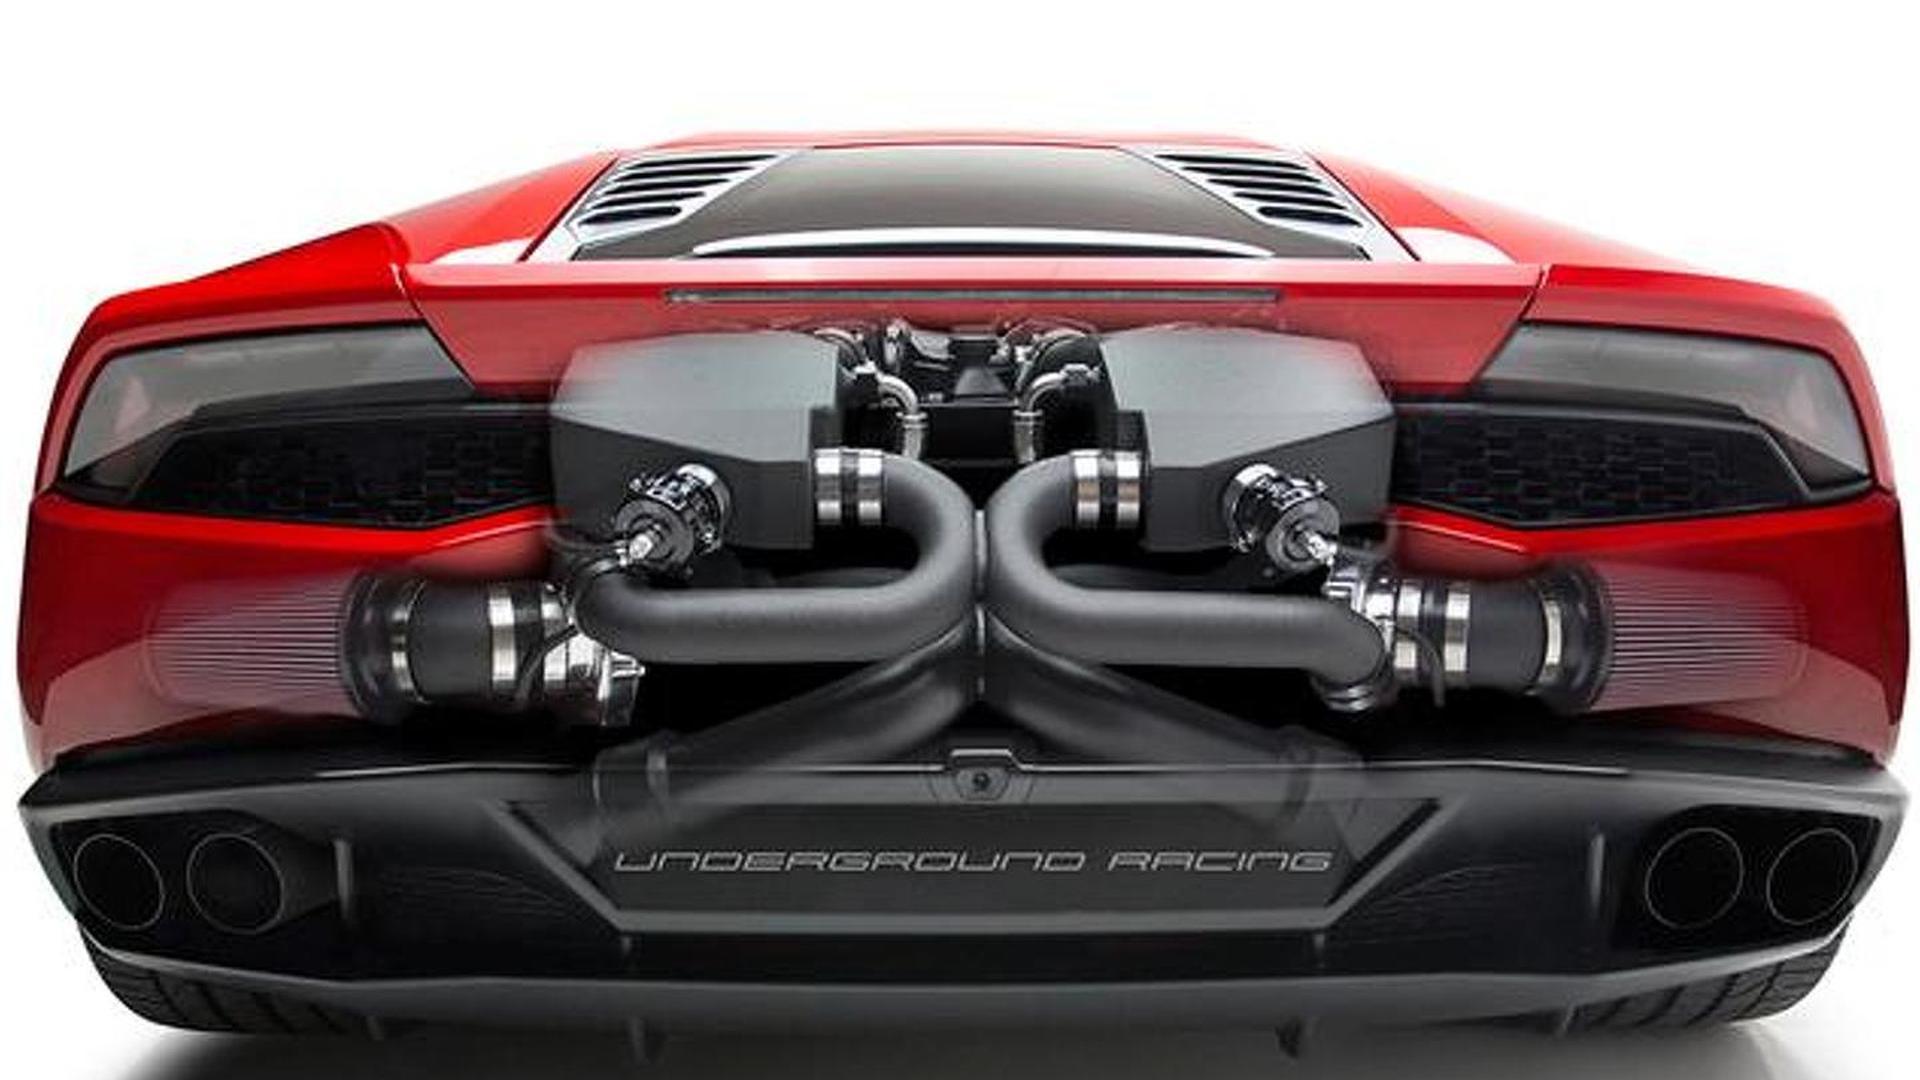 Тюнингованный Lamborghini Huracan от Underground Racing